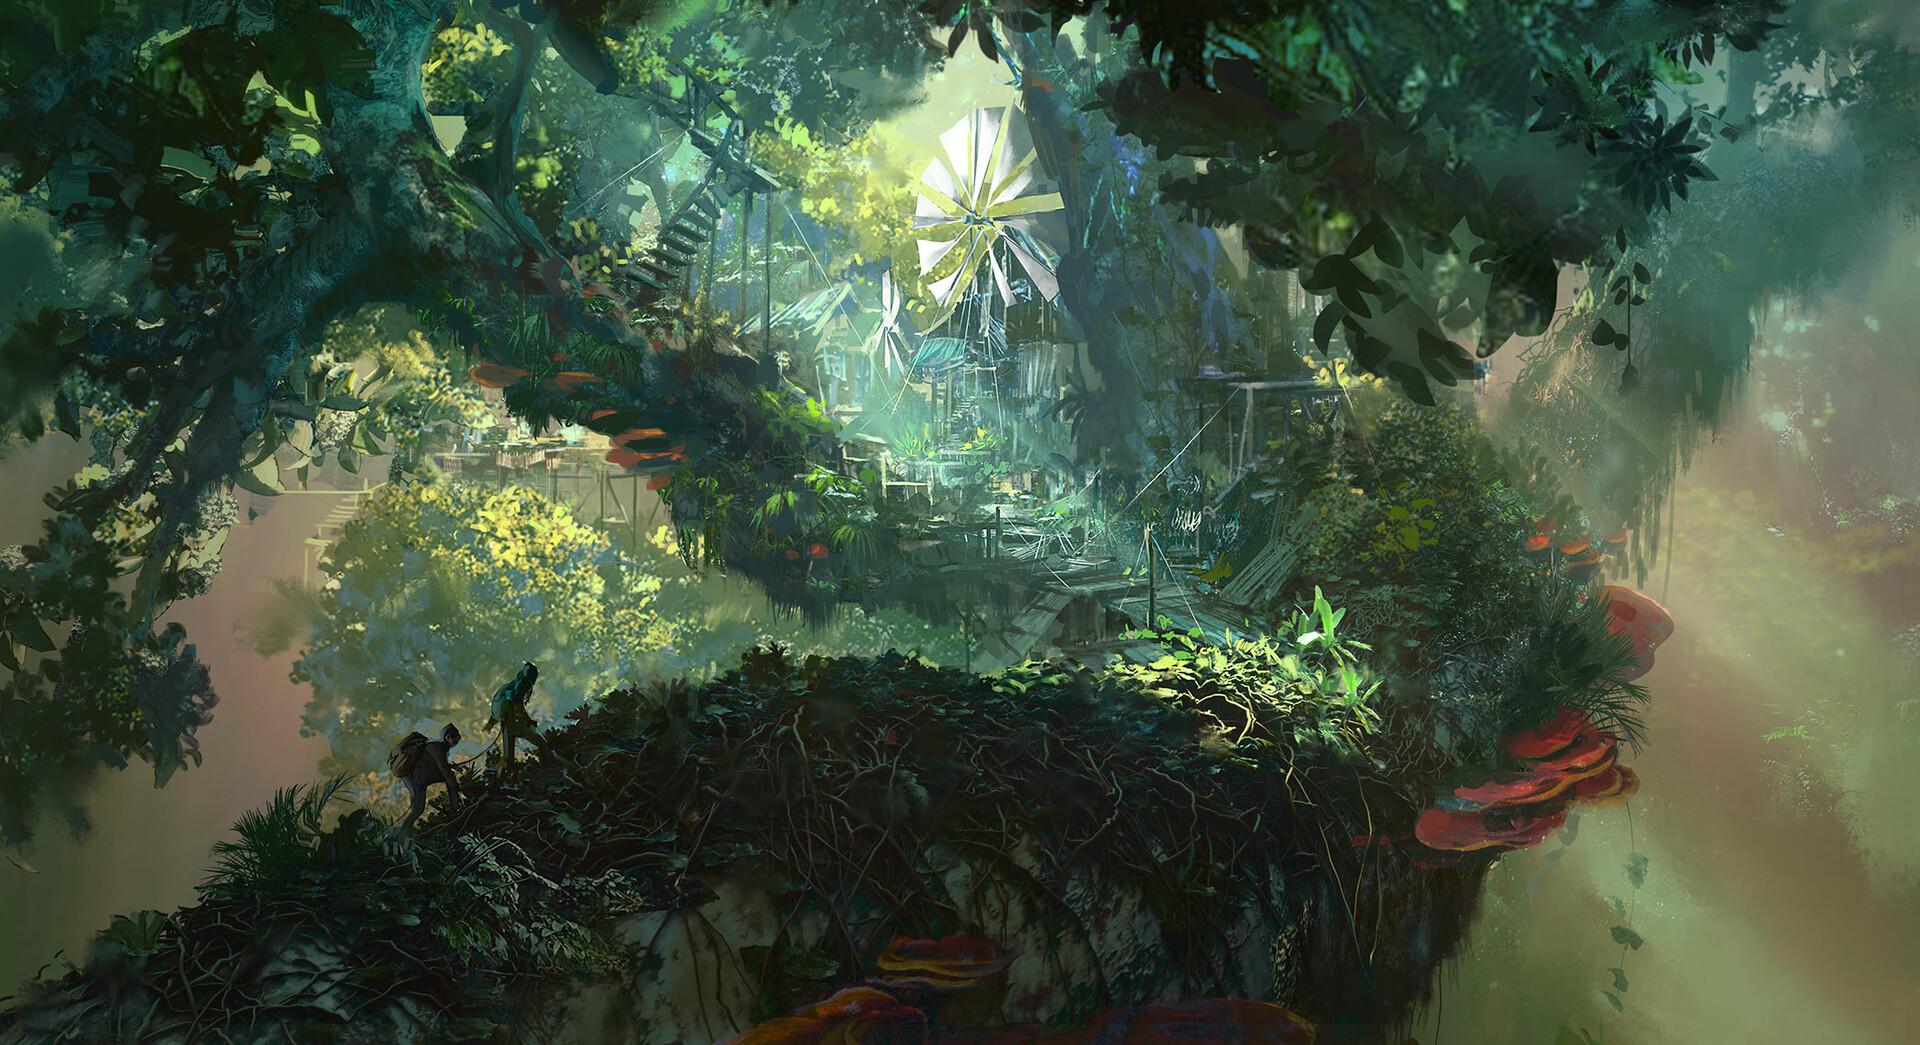 General 1920x1045 tree house treehouse treehouses jungle digital art artwork green